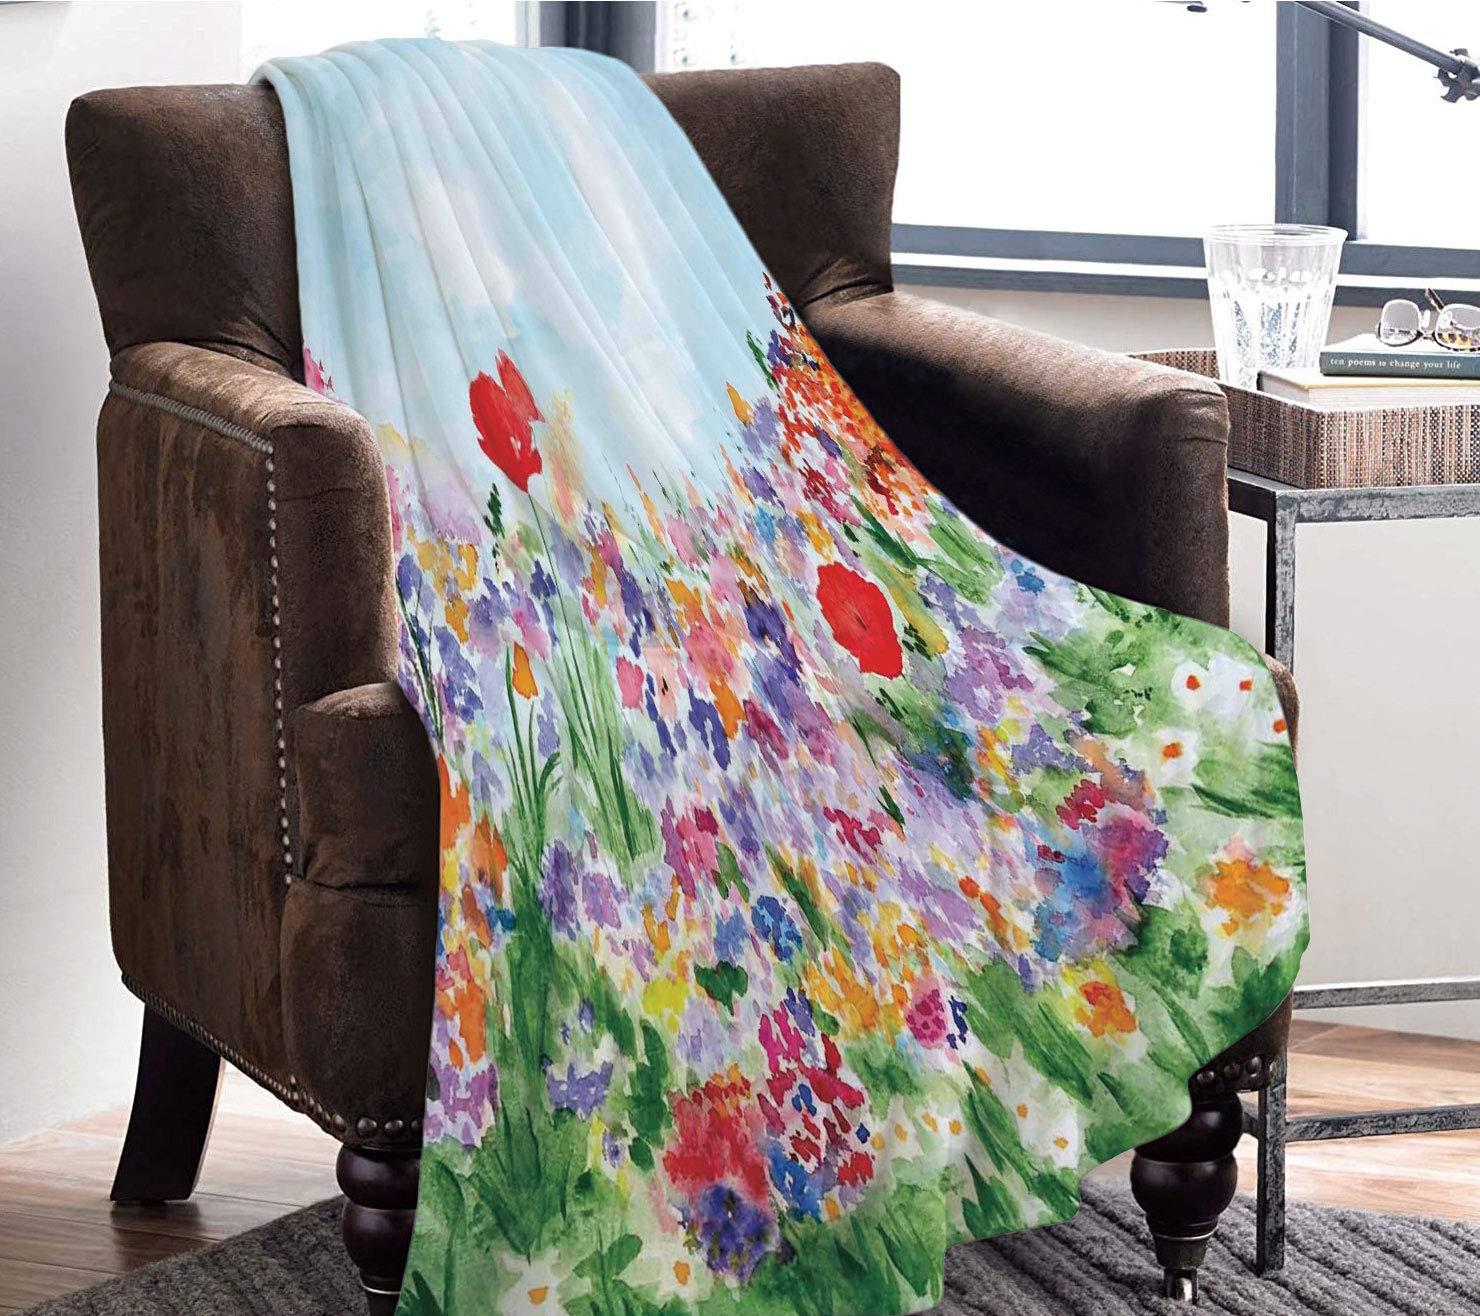 Amazon.com: YOLIYANA Blanket Bedspread Soft Fleece Throw ...